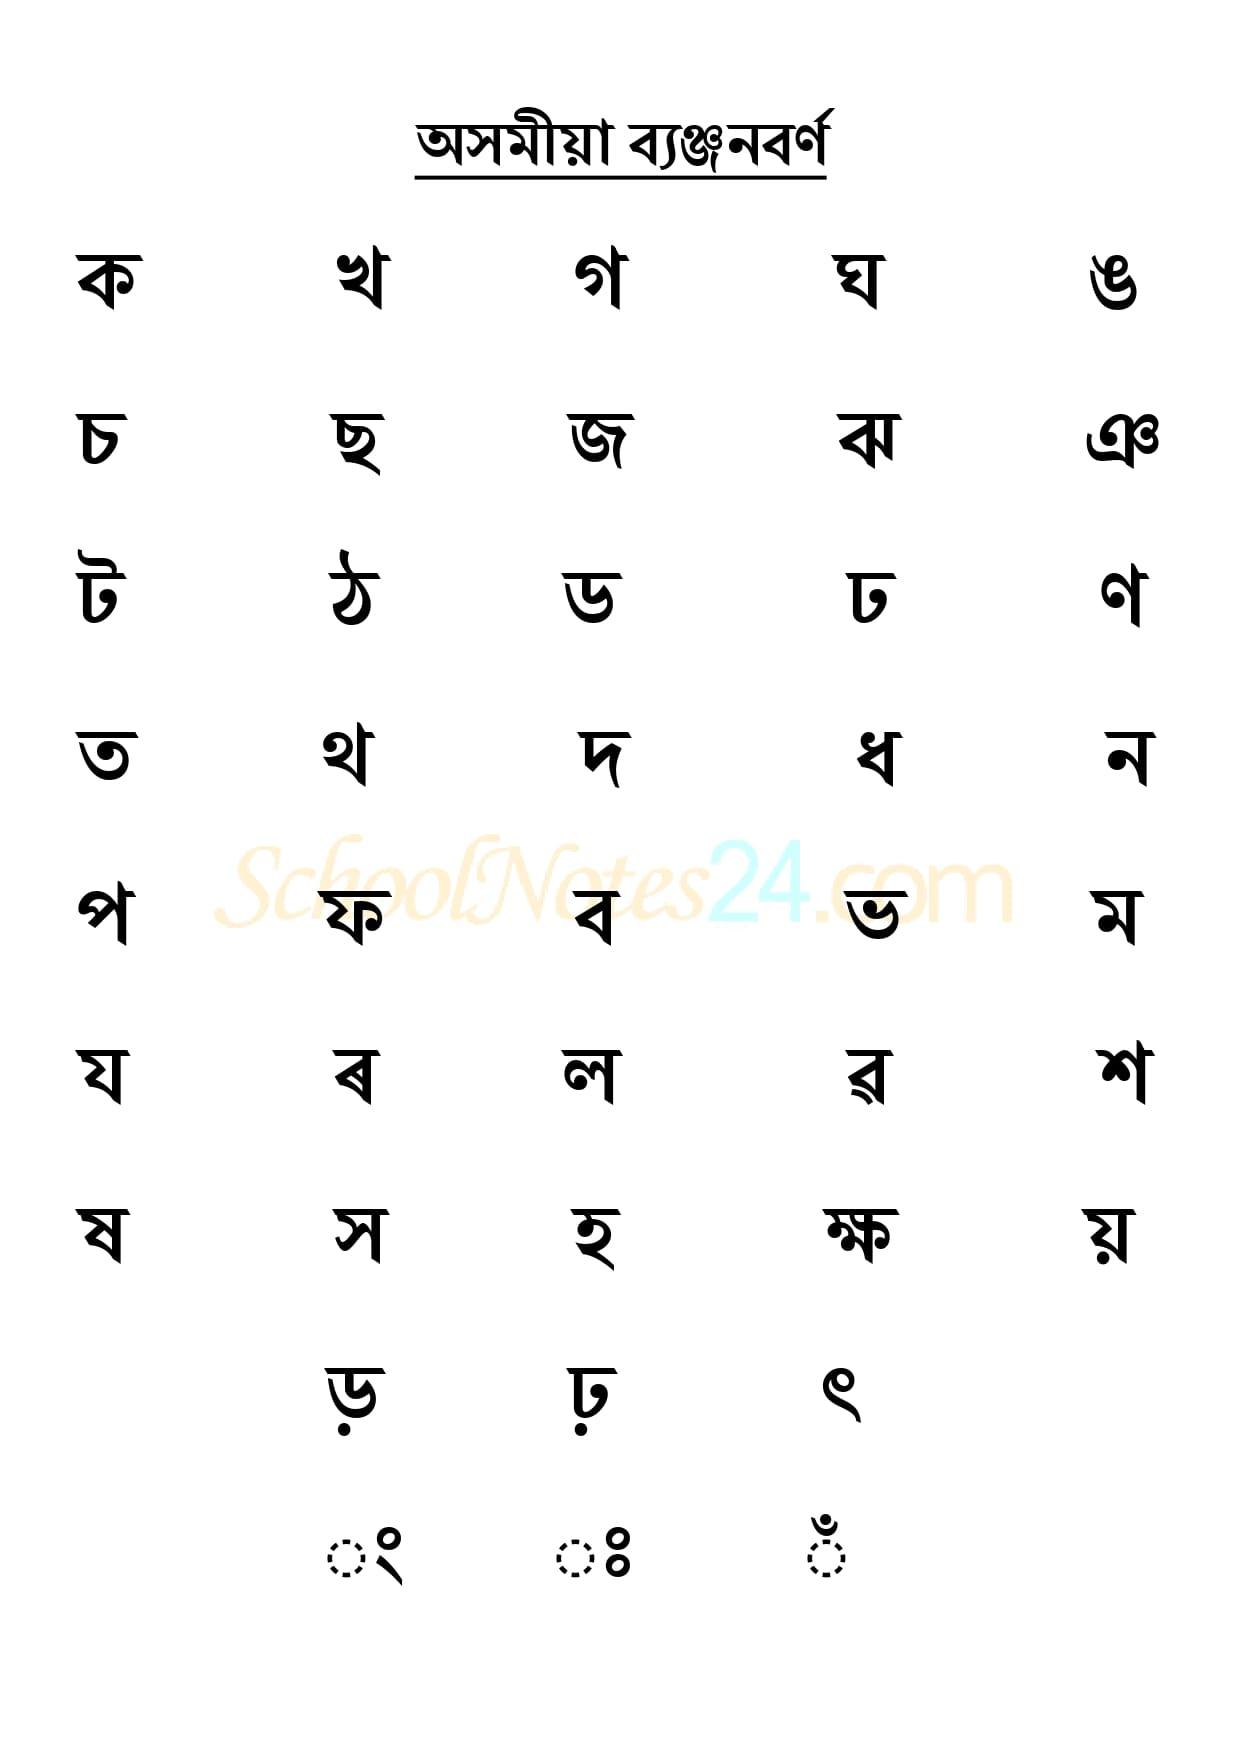 assamese-language-alphabet